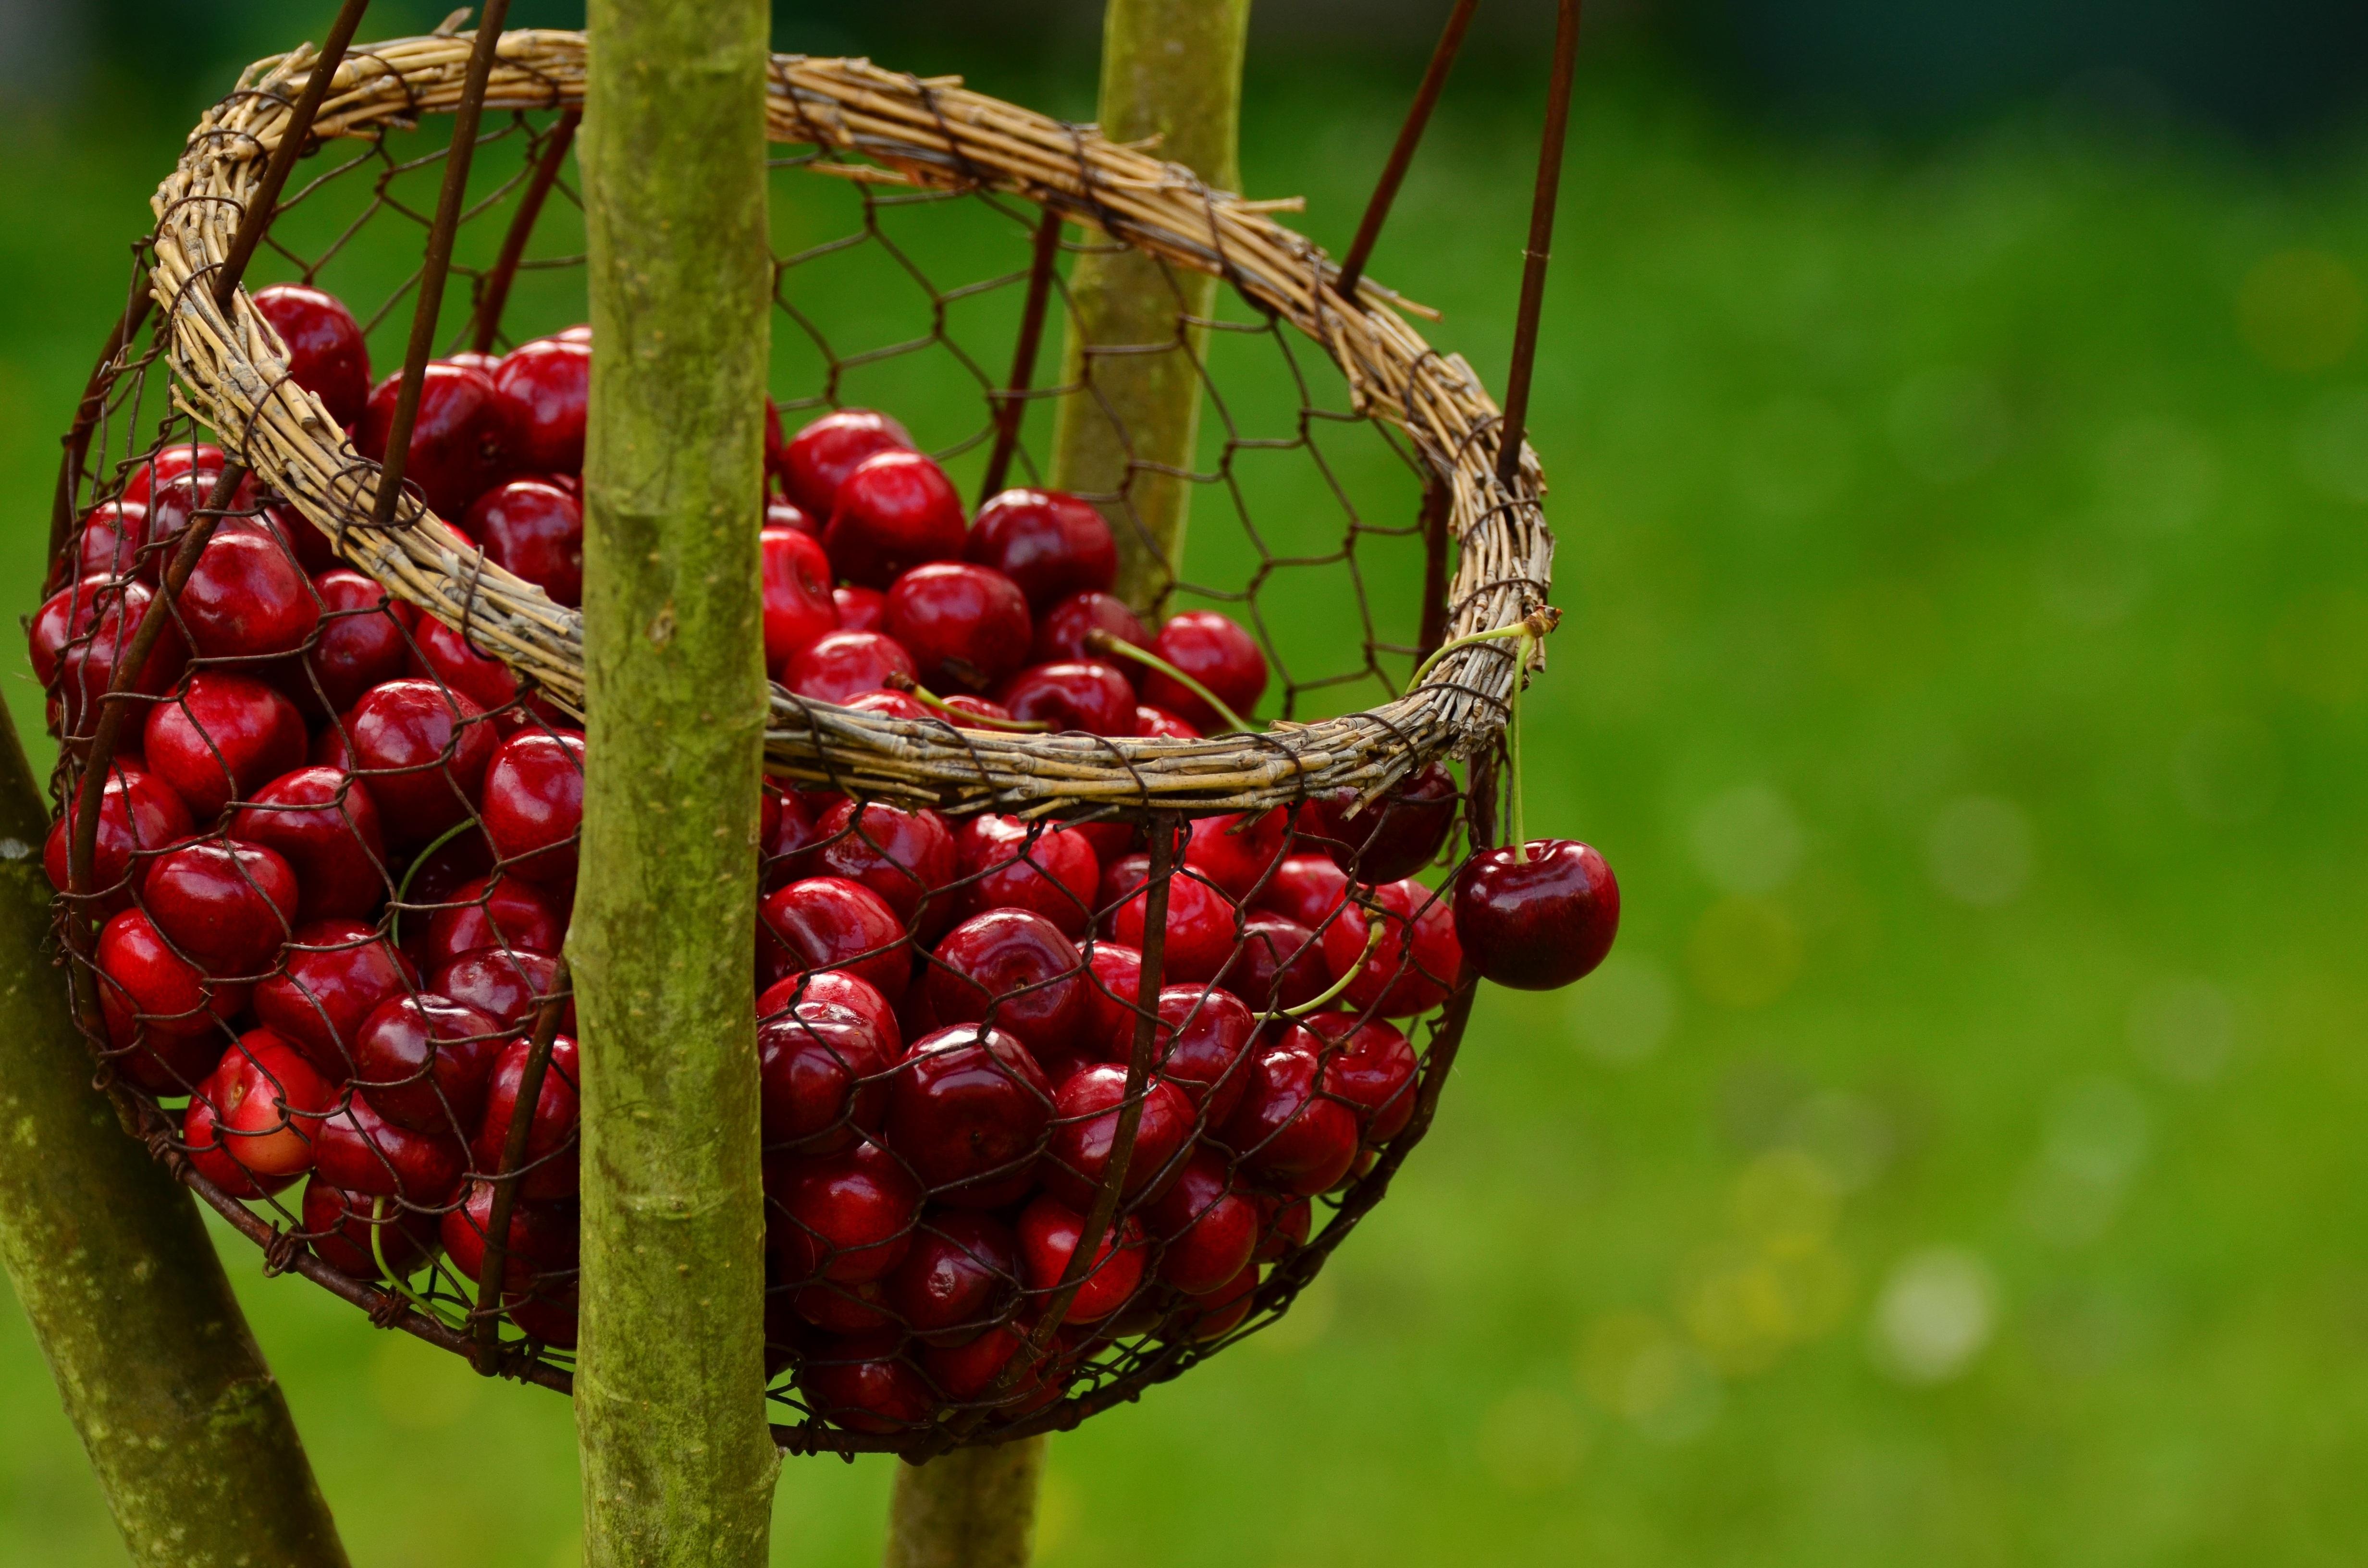 Cherries Basket, Basket, Cherries, Cherry, Food, HQ Photo